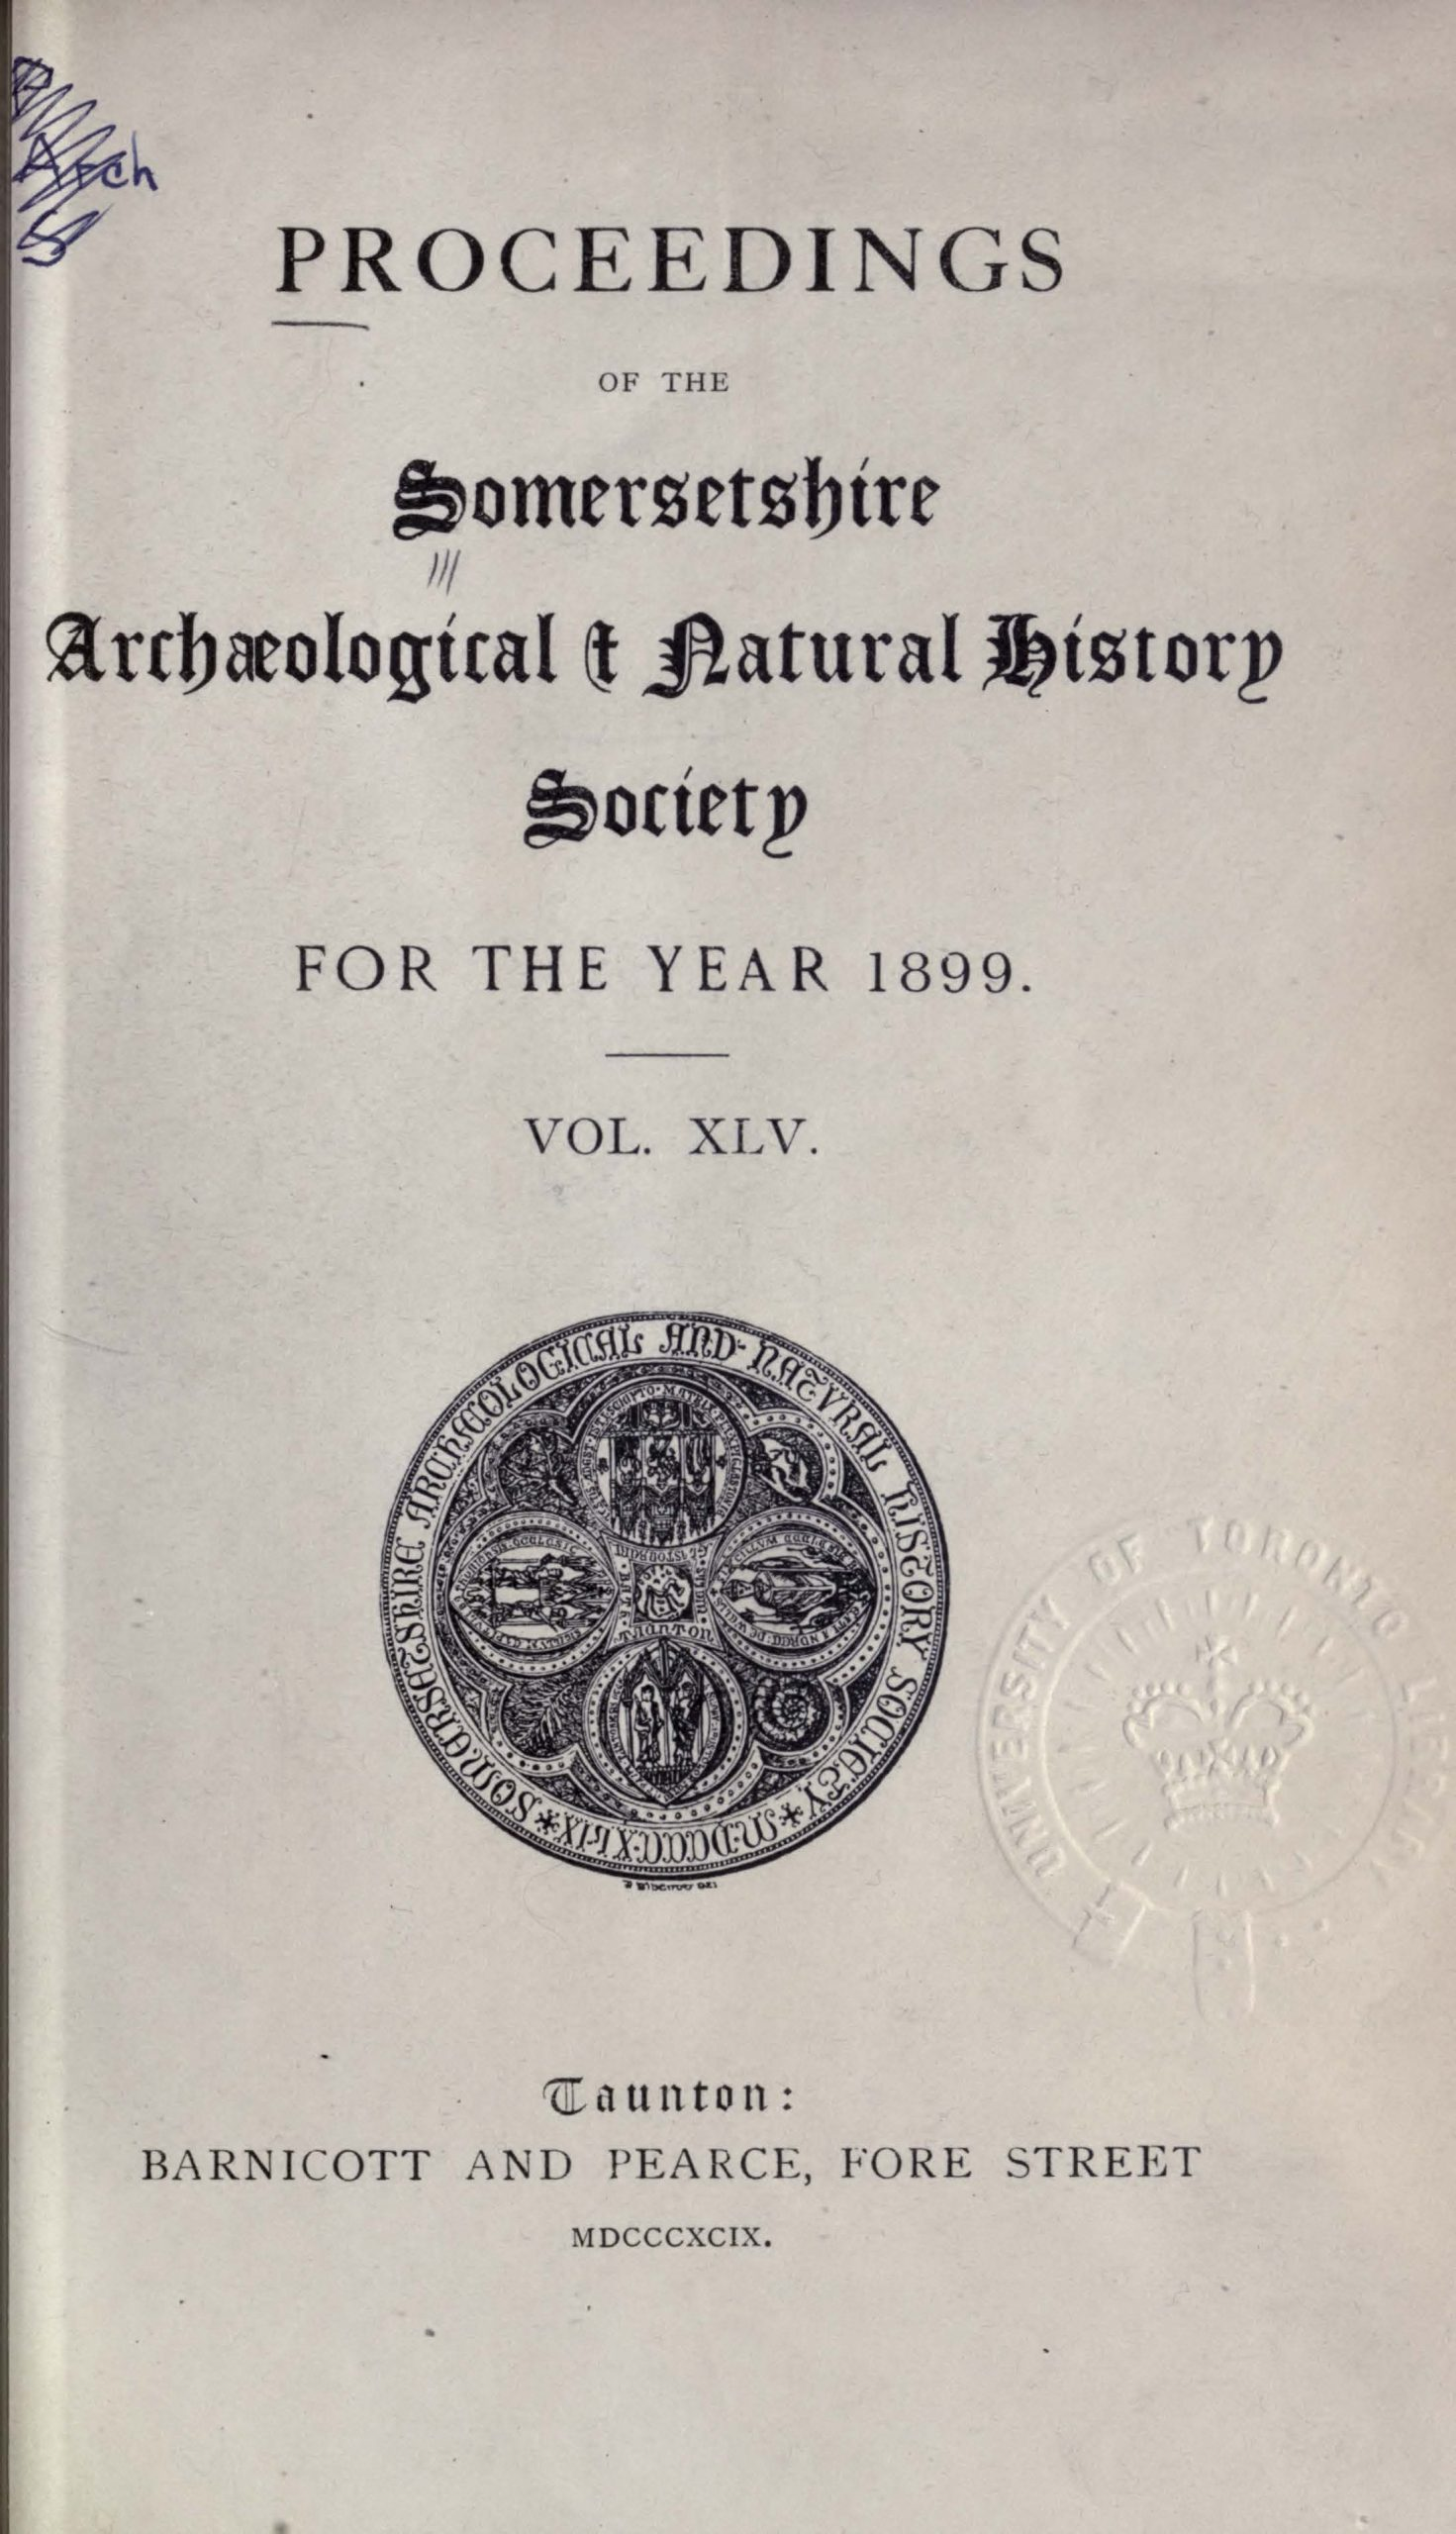 SANHS Proceedings Volume 45 cover